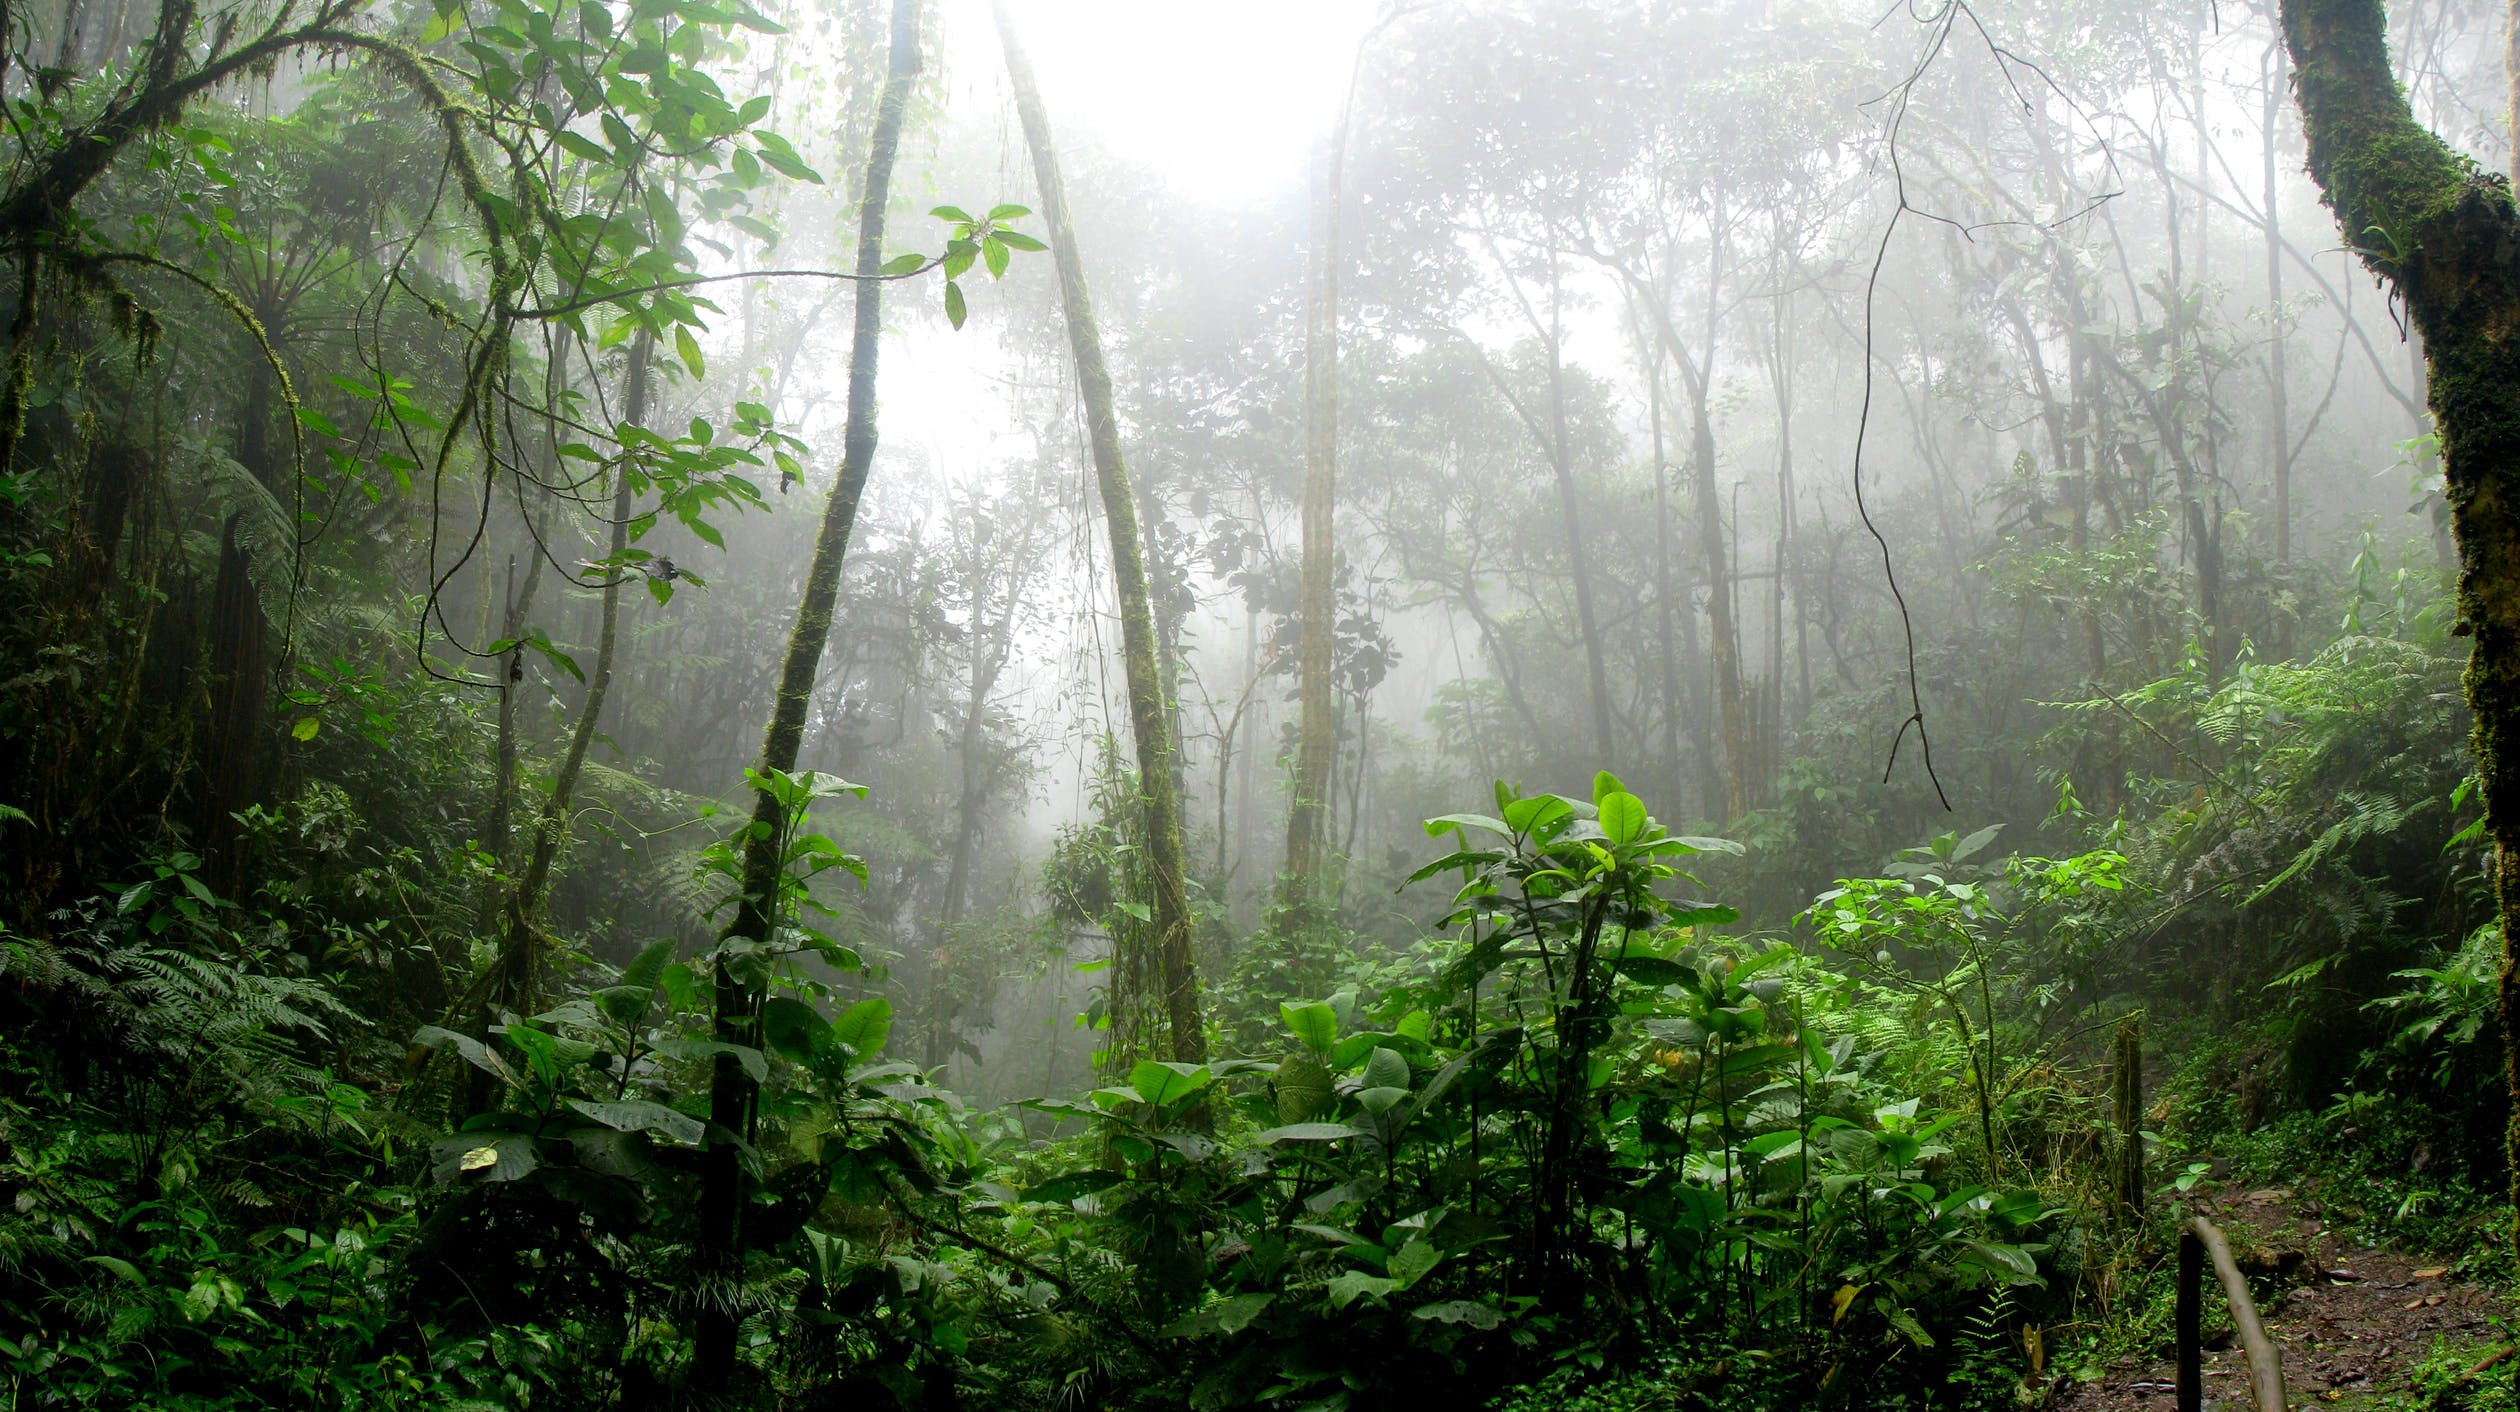 rainforest = ป่าทึบเขตร้อน